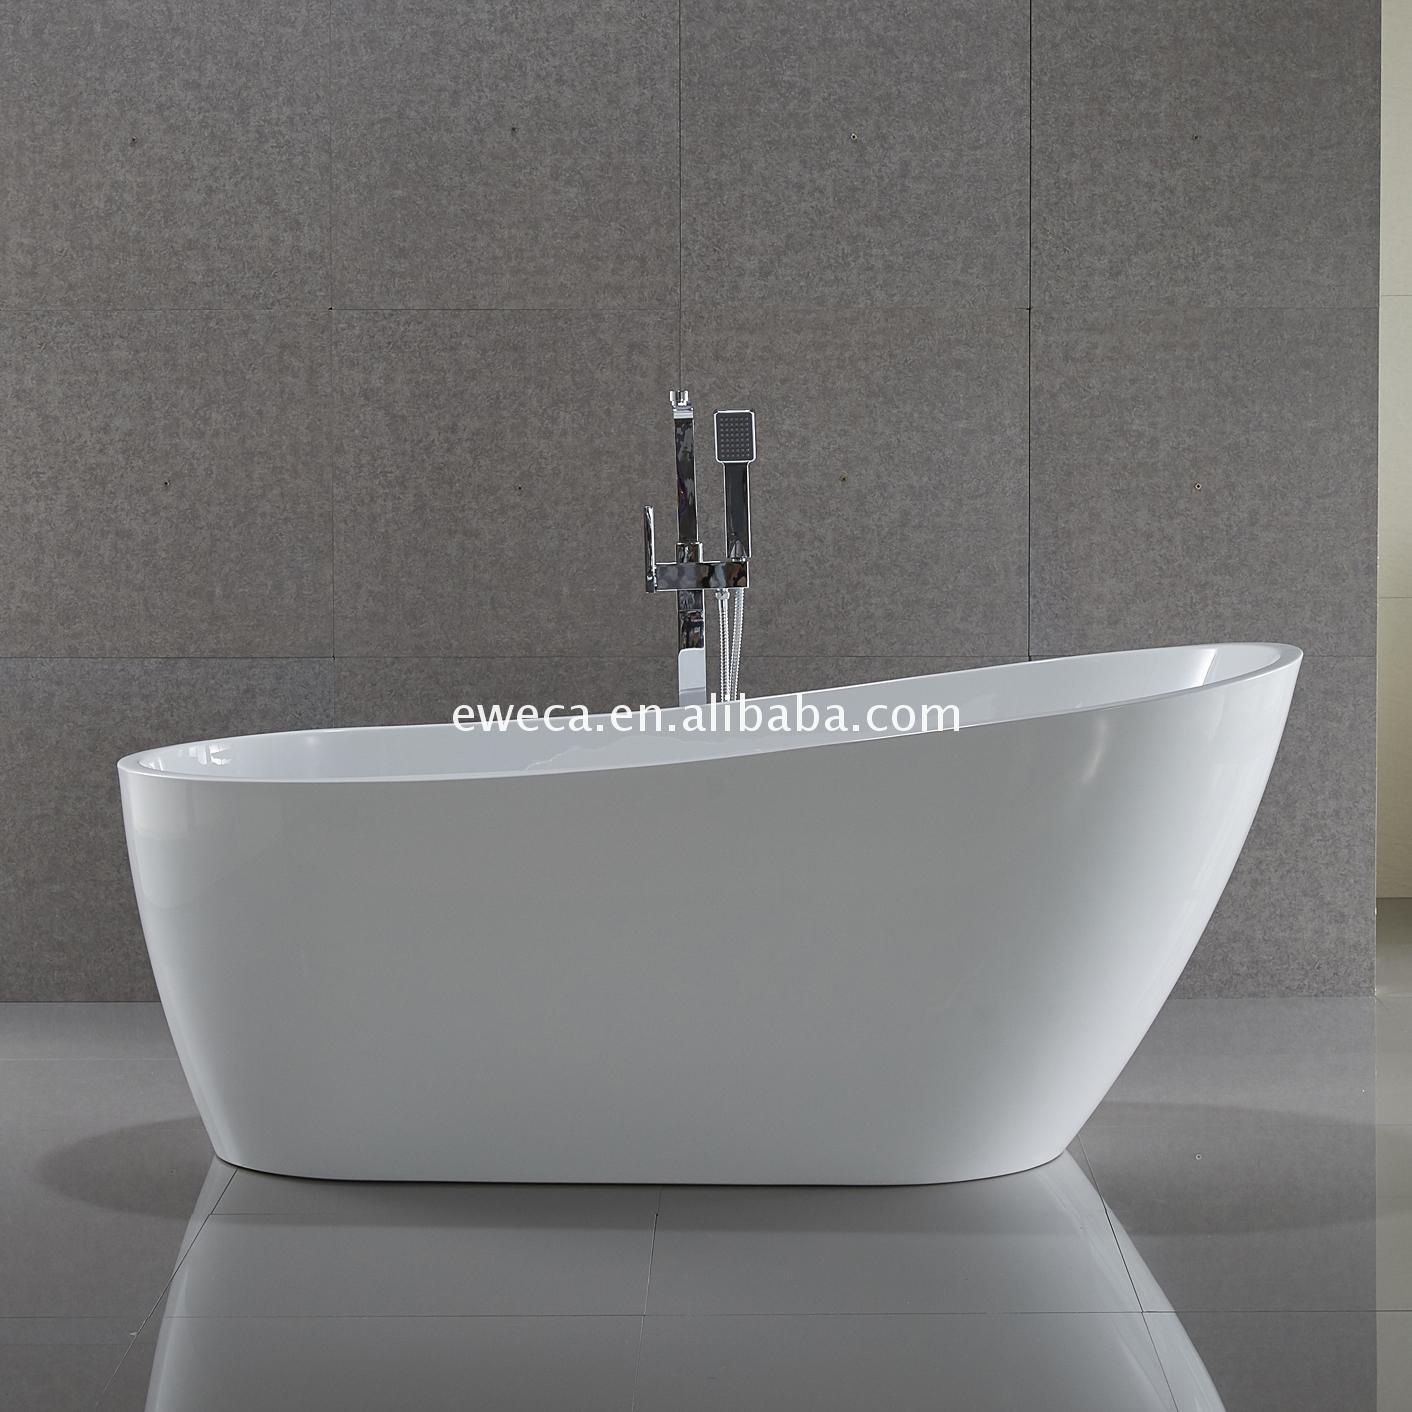 Hest Selling Enamel Stainless Steel Bathtub With Low Price - Buy ...